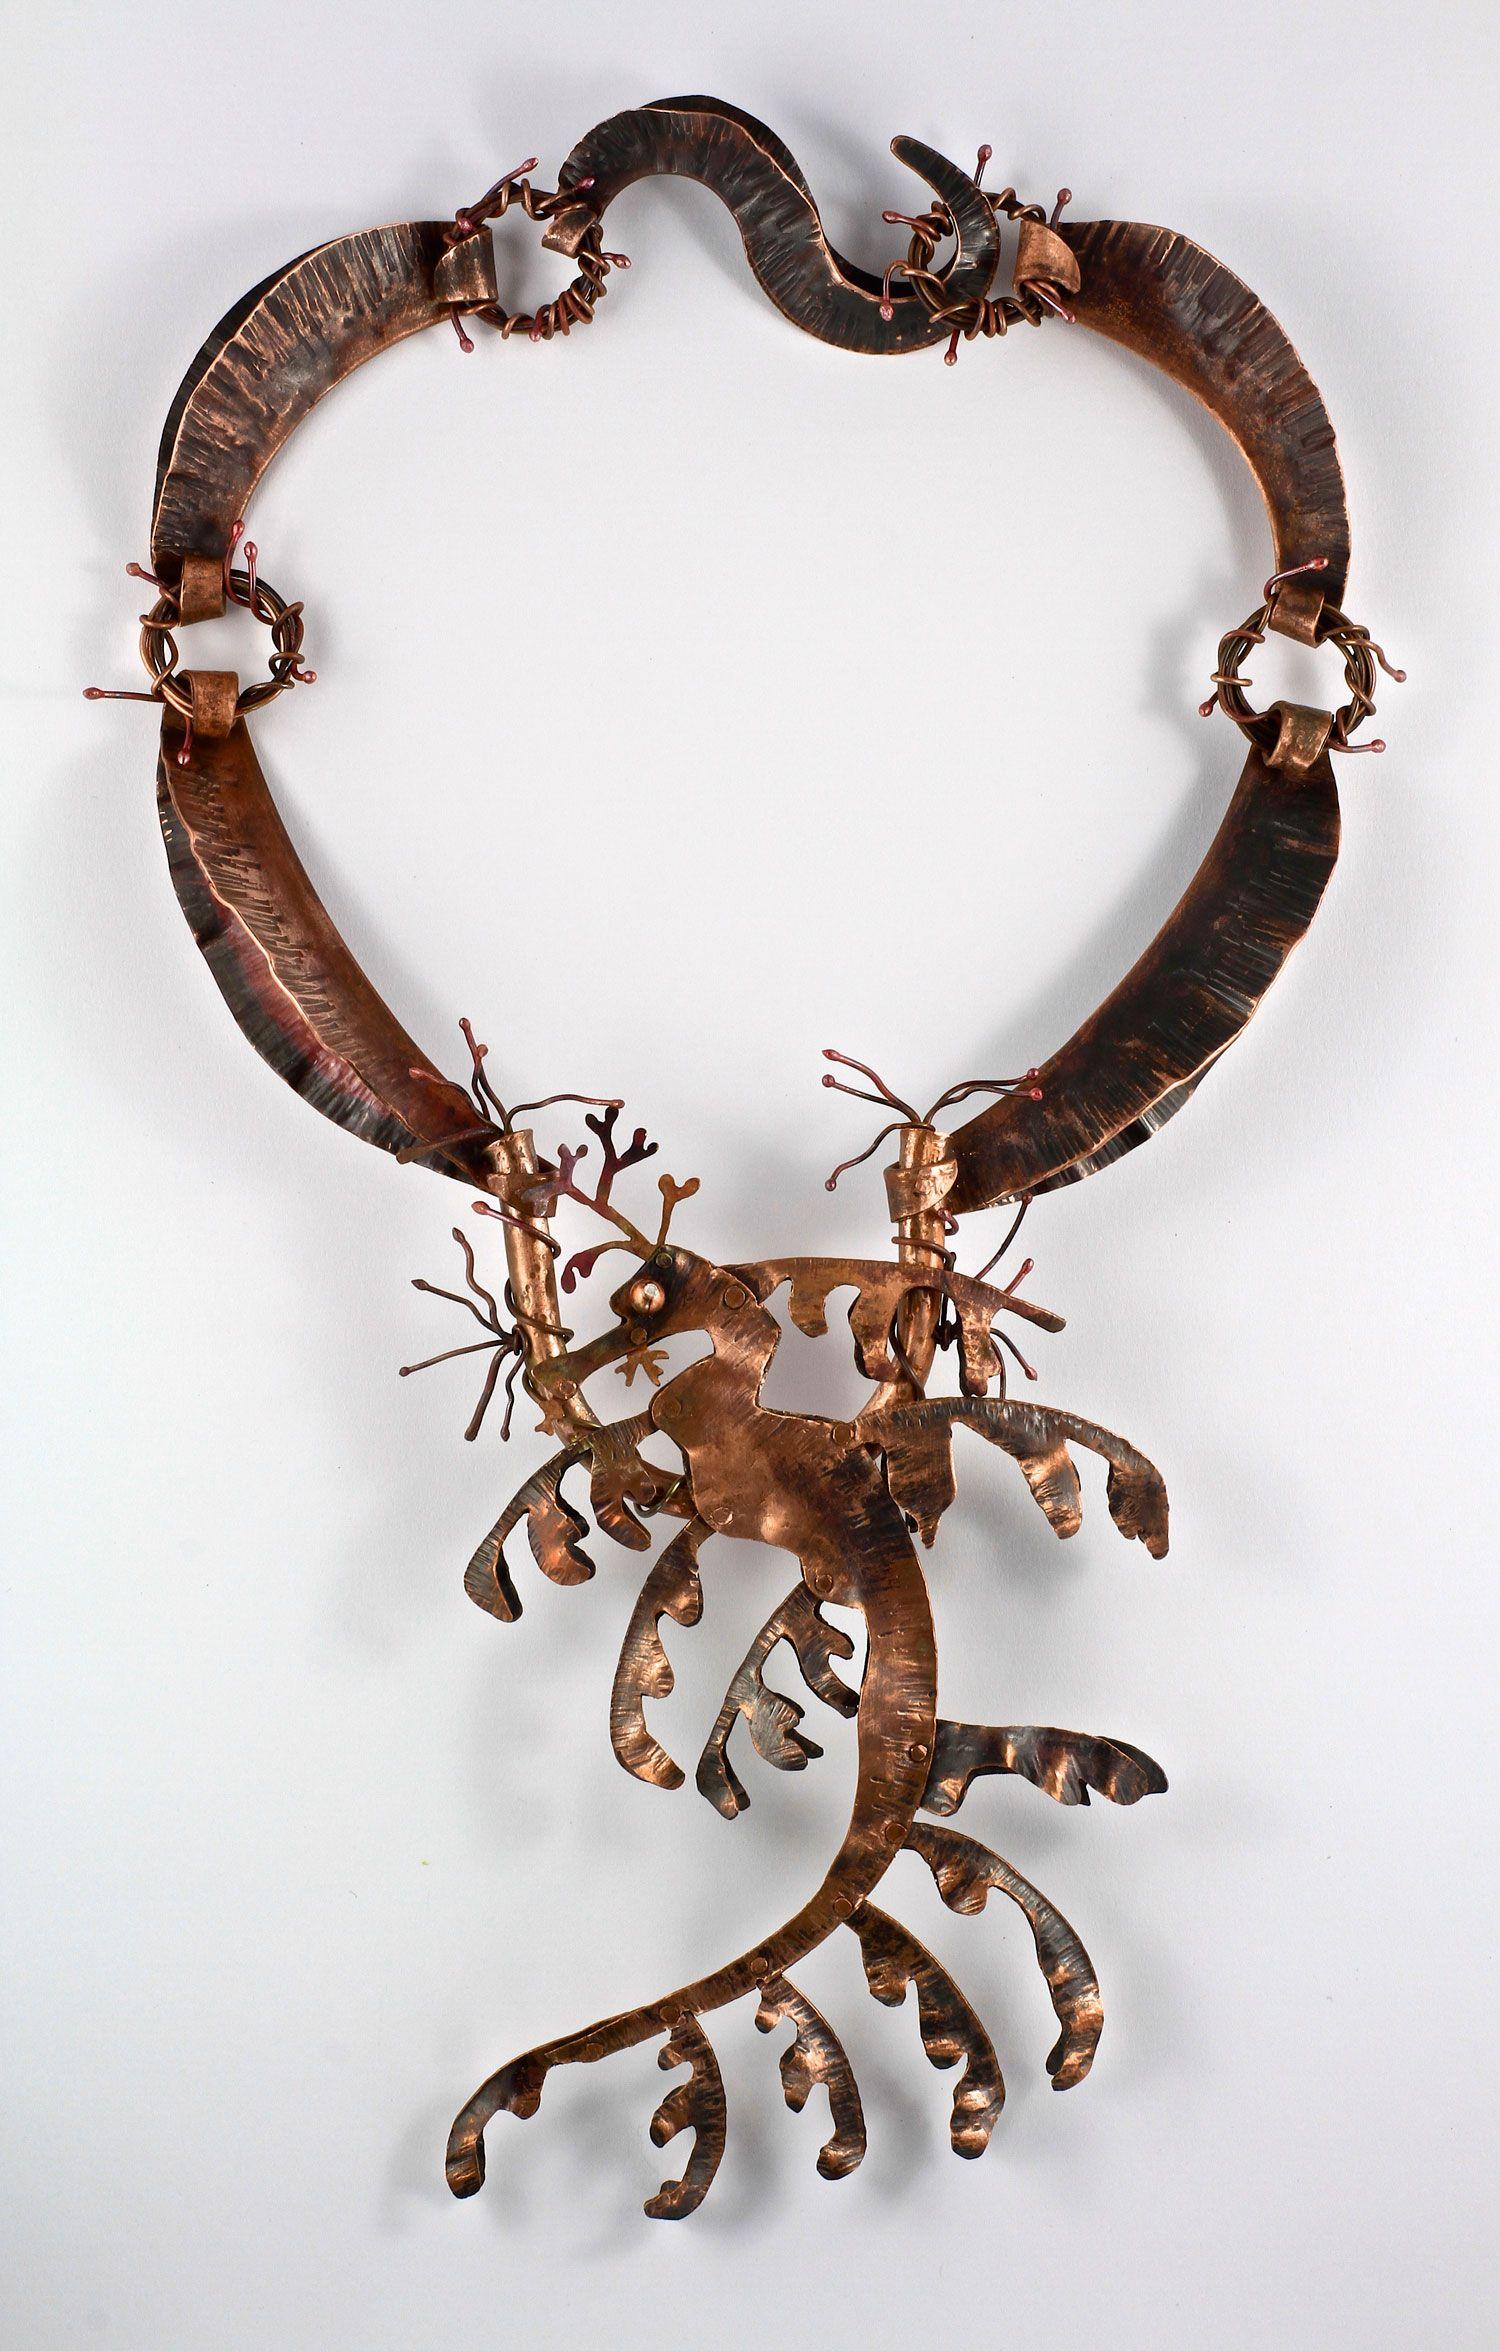 Leafy Sea Dragon - my entry in the Lewton-Brain Foldform competition 2013.